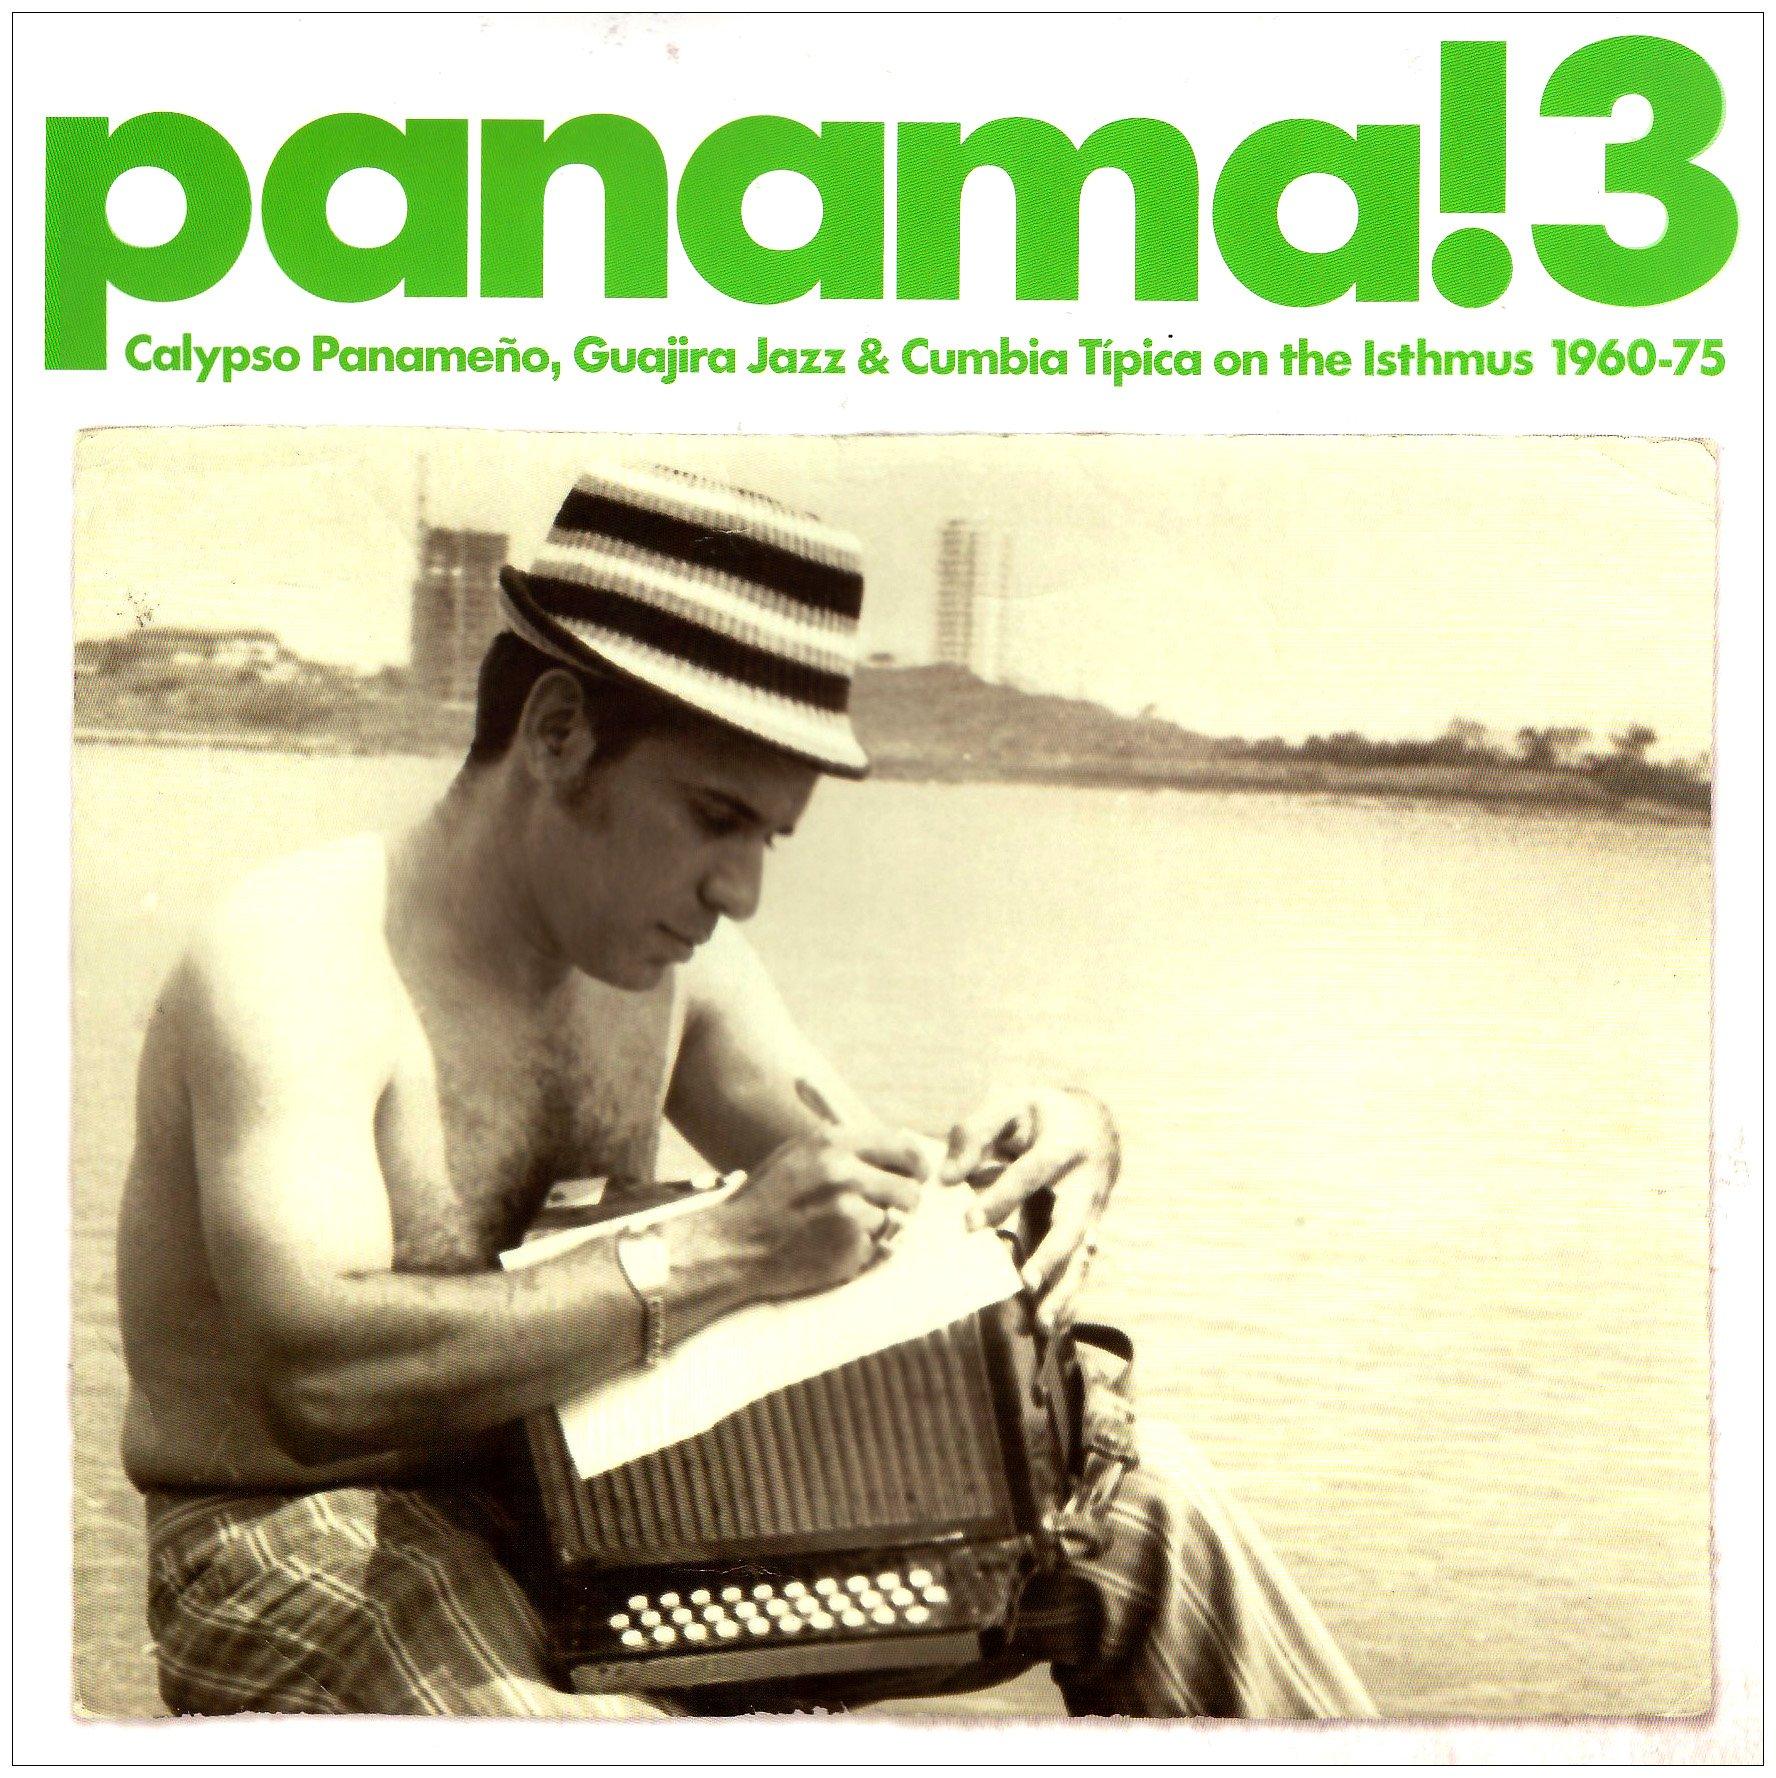 Panama! 3: Calypso Panameno, Guajira Jazz and Cumbia Tipica on Theisthmus 1960-1975 [Vinyl] by SOUNDWAY RECORDS